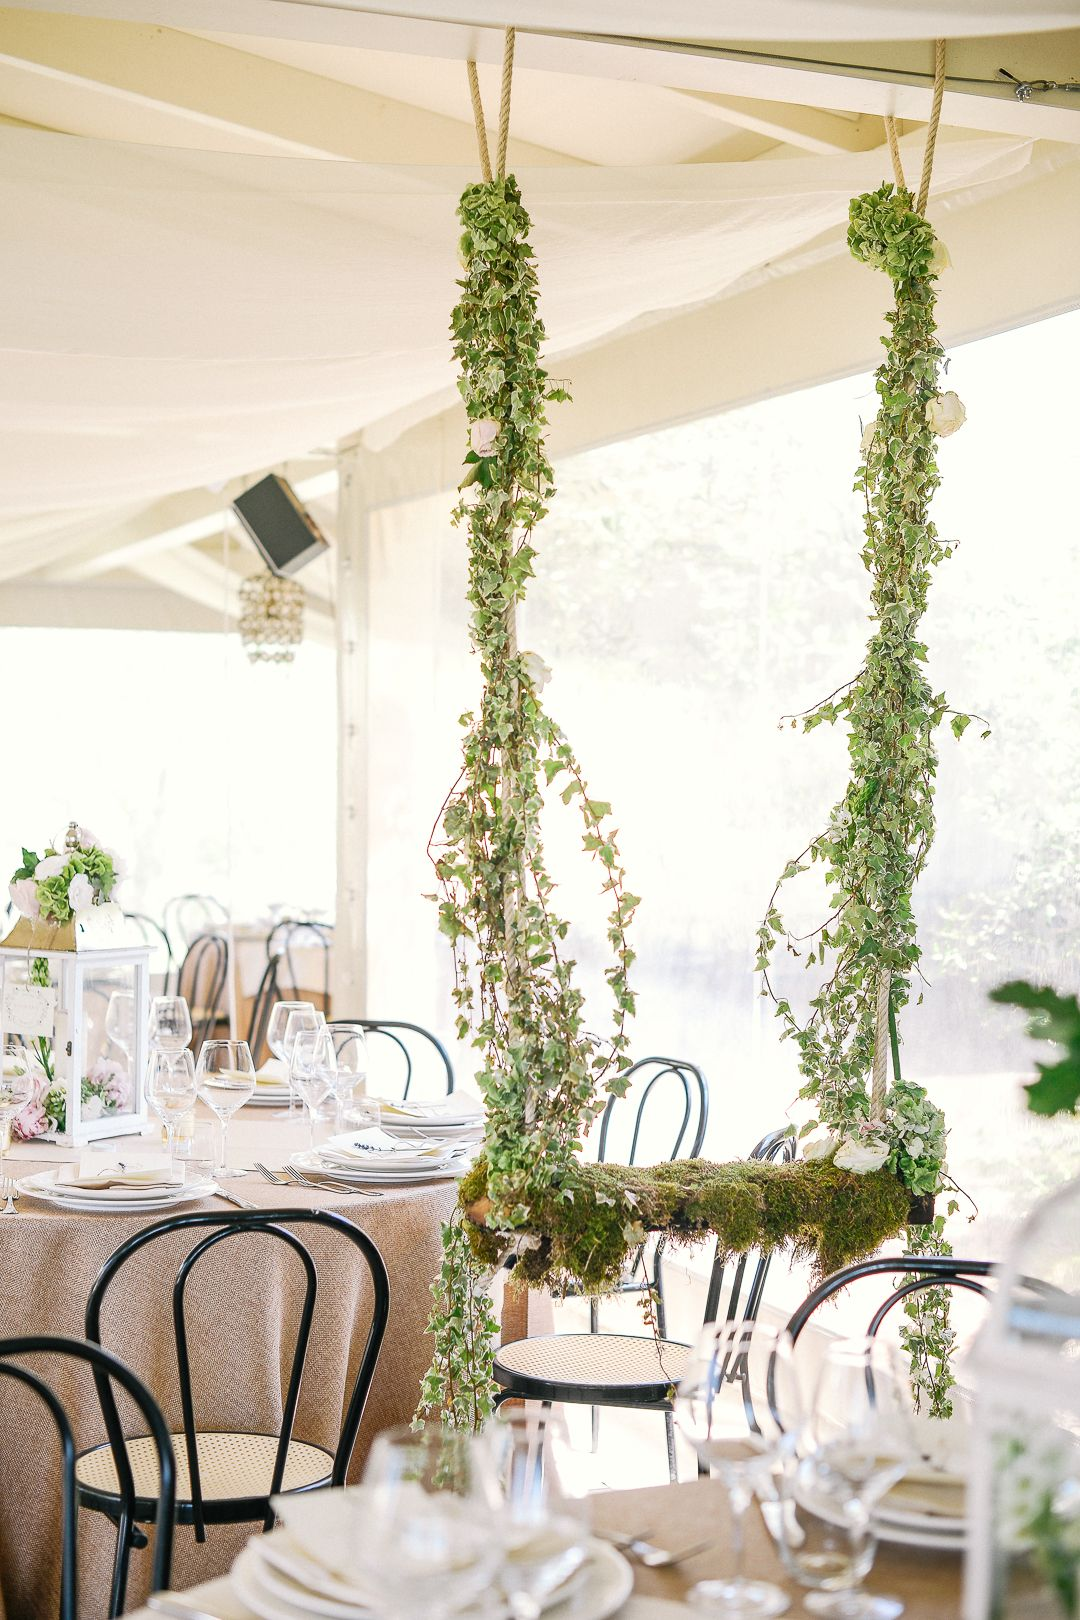 Elegant Country Chic Italian Wedding Decor Details For Weddings